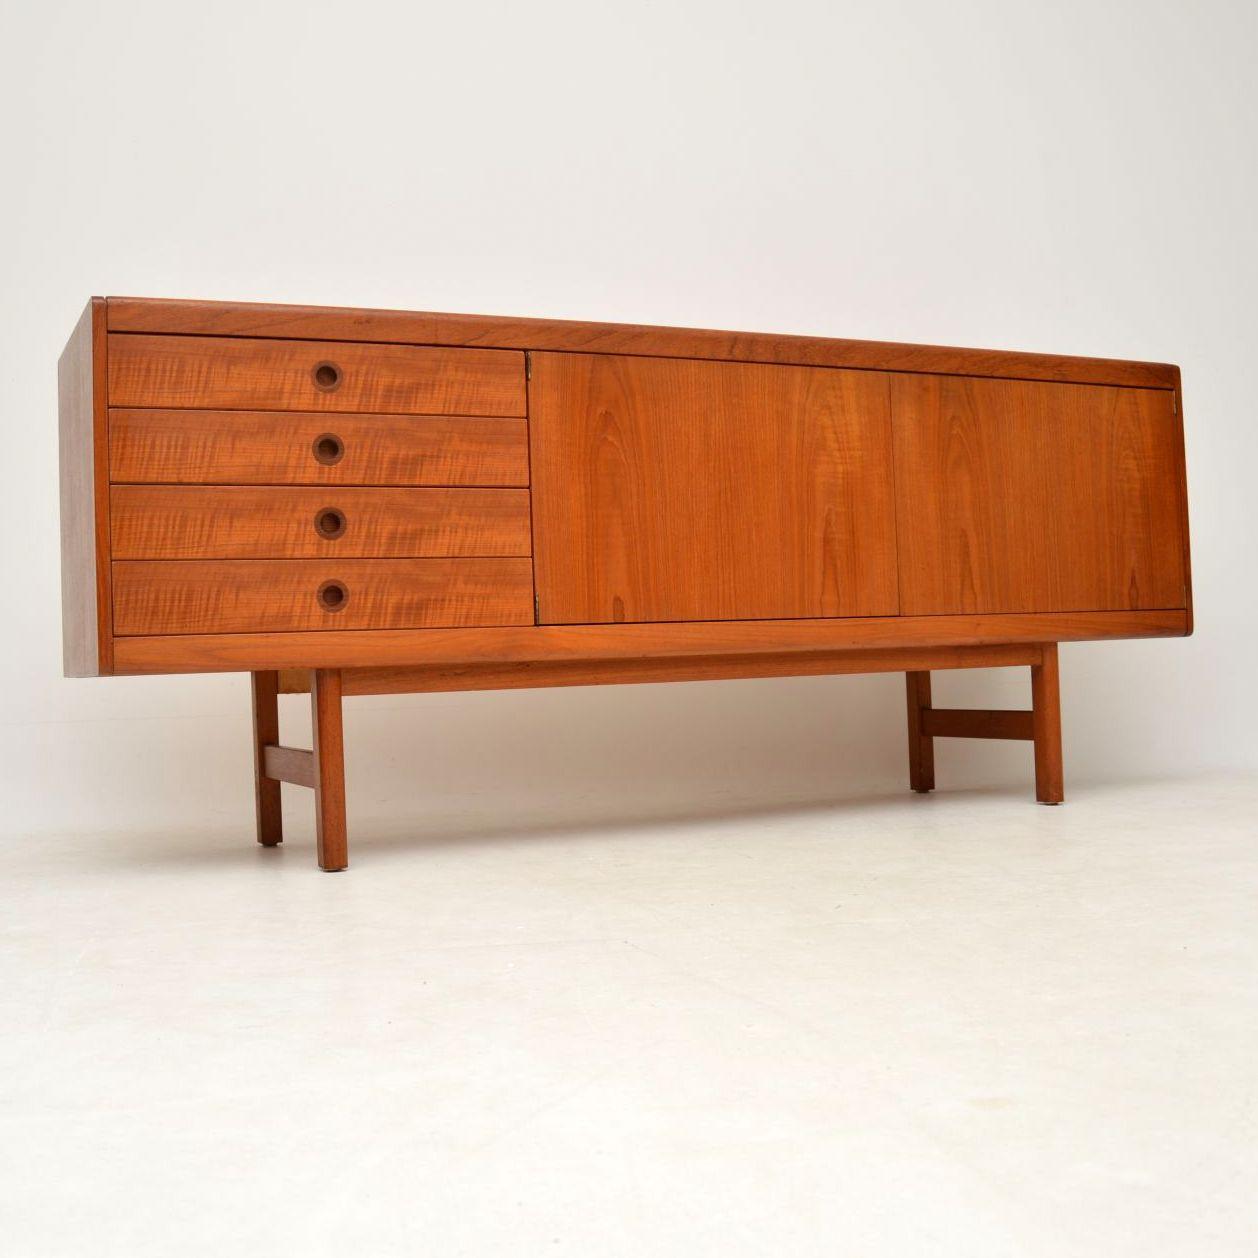 teak_vintage_retro_sideboard_by_robert_heritage_archie_shine_1